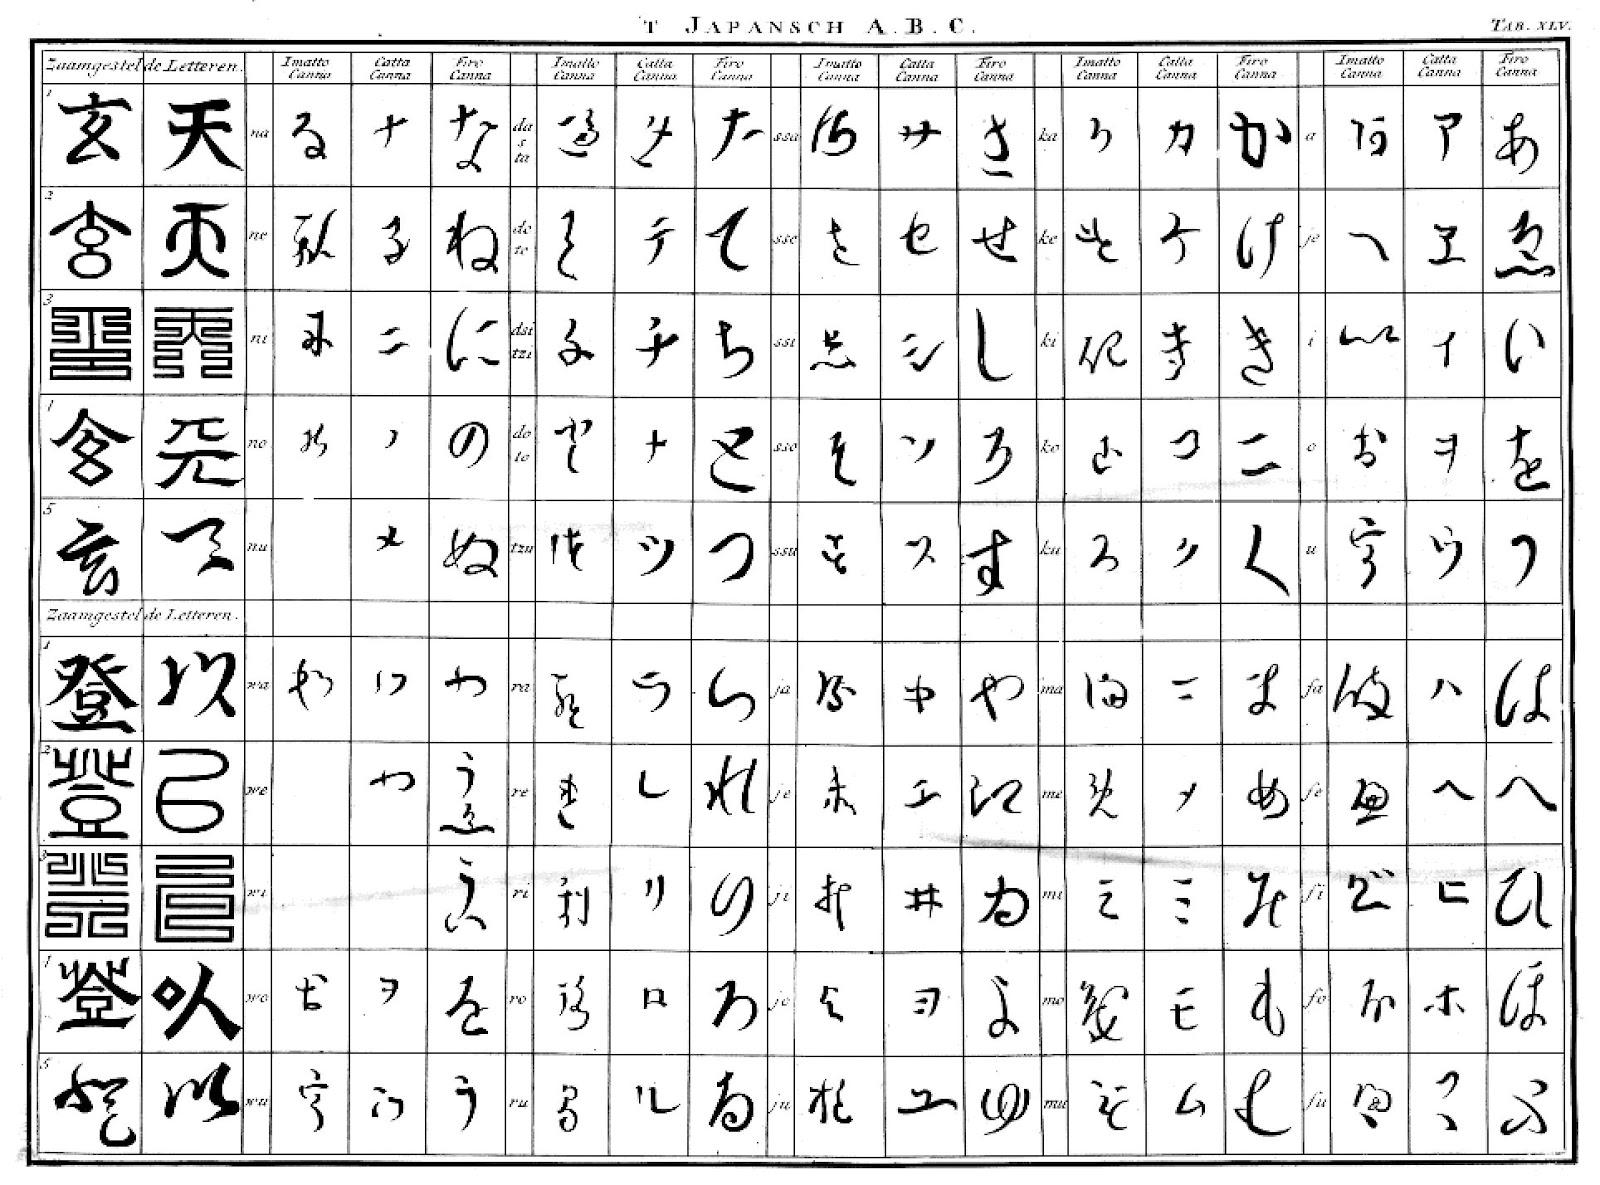 Japanese Alphabet Letters A-Z